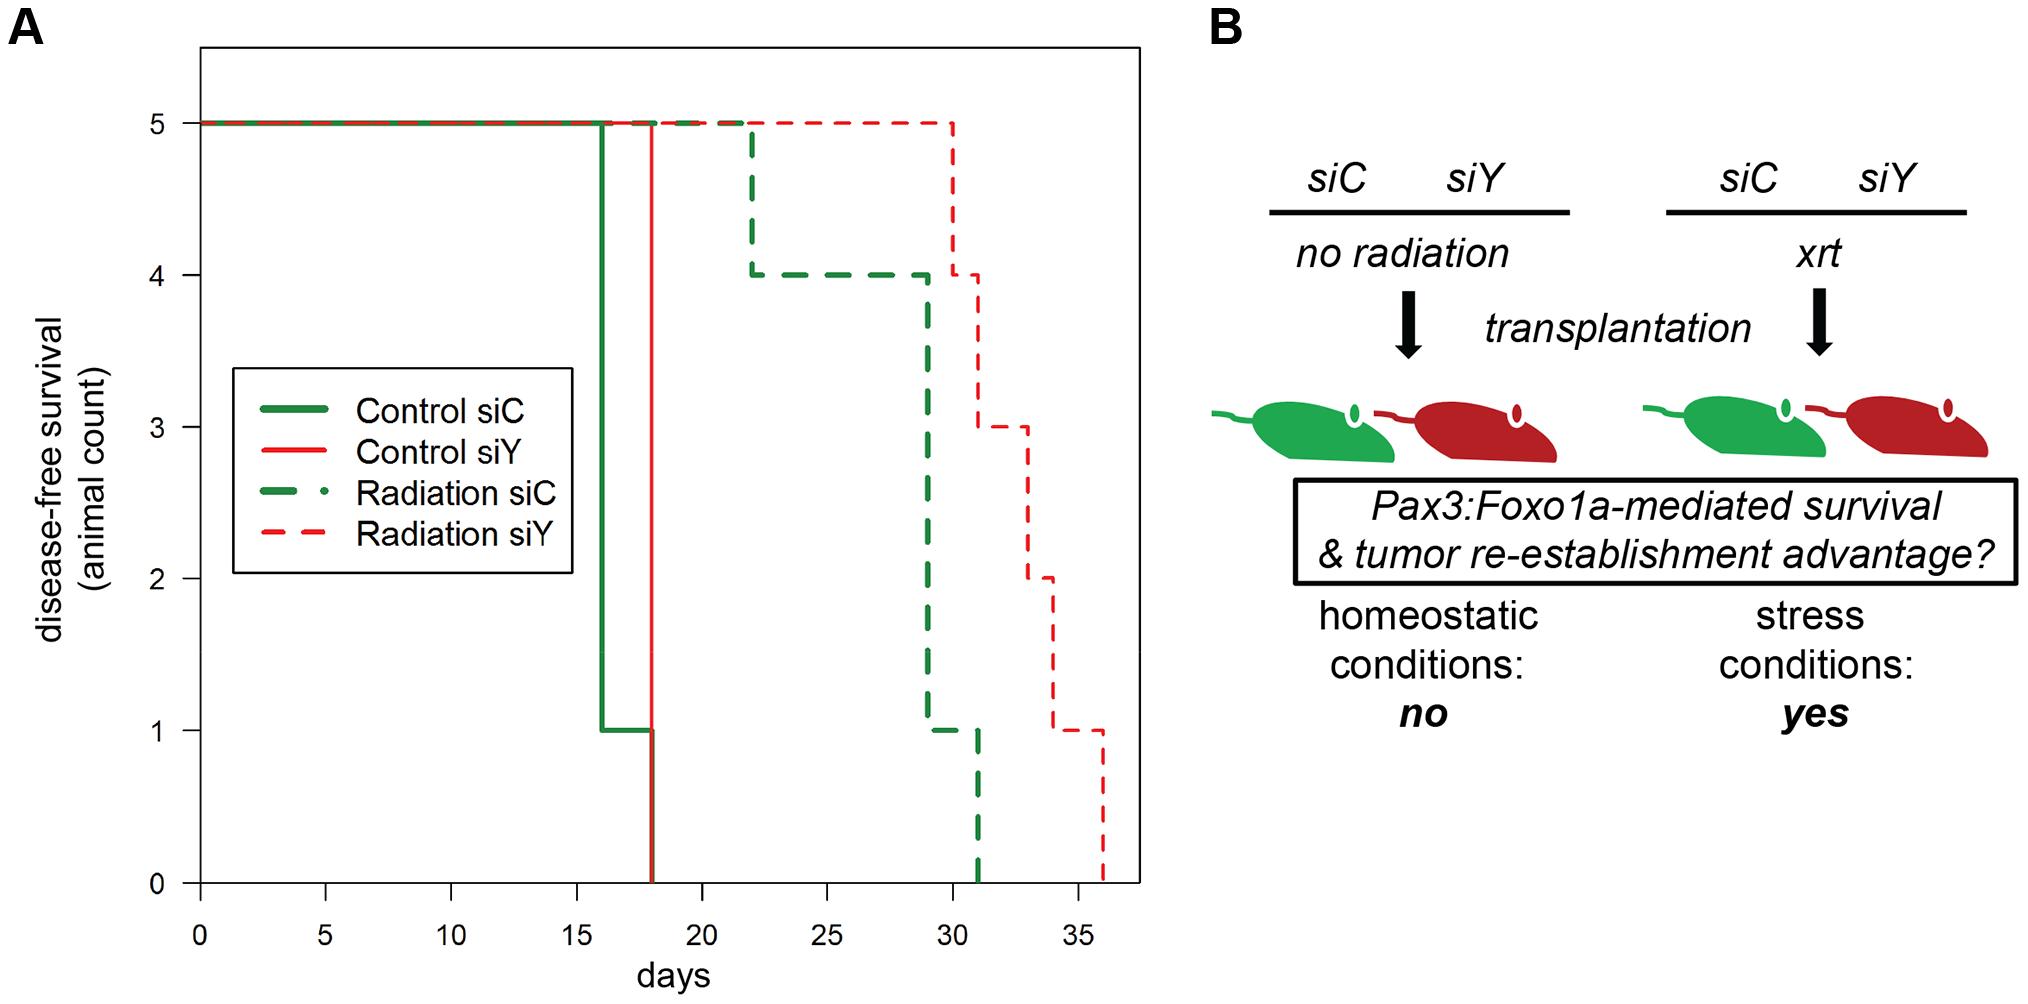 Treatment-related implications for dynamic oncogene expression in rhabdomyosarcoma <i>in vivo</i>.